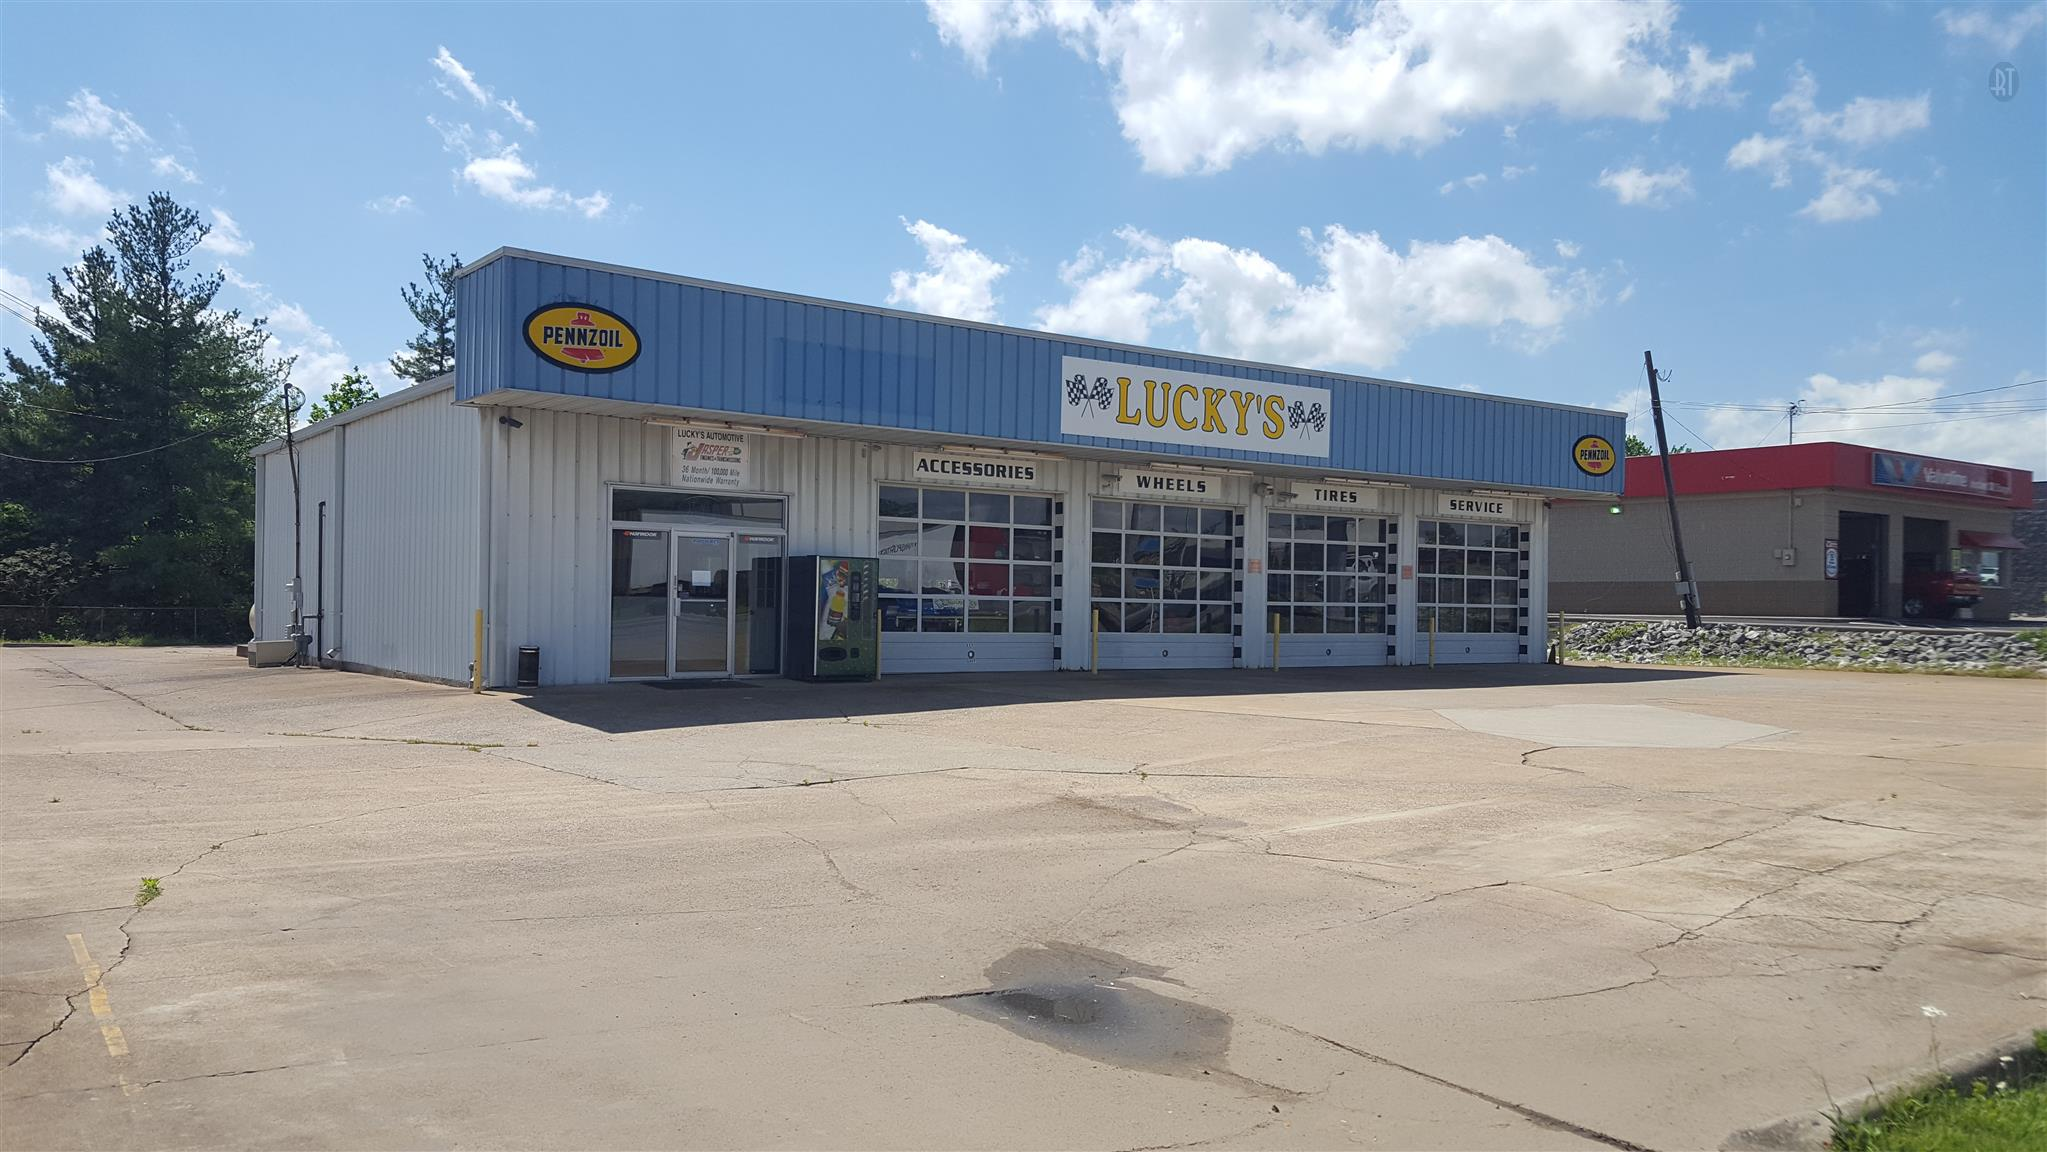 526 Highway 46 S, Dickson, TN 37055